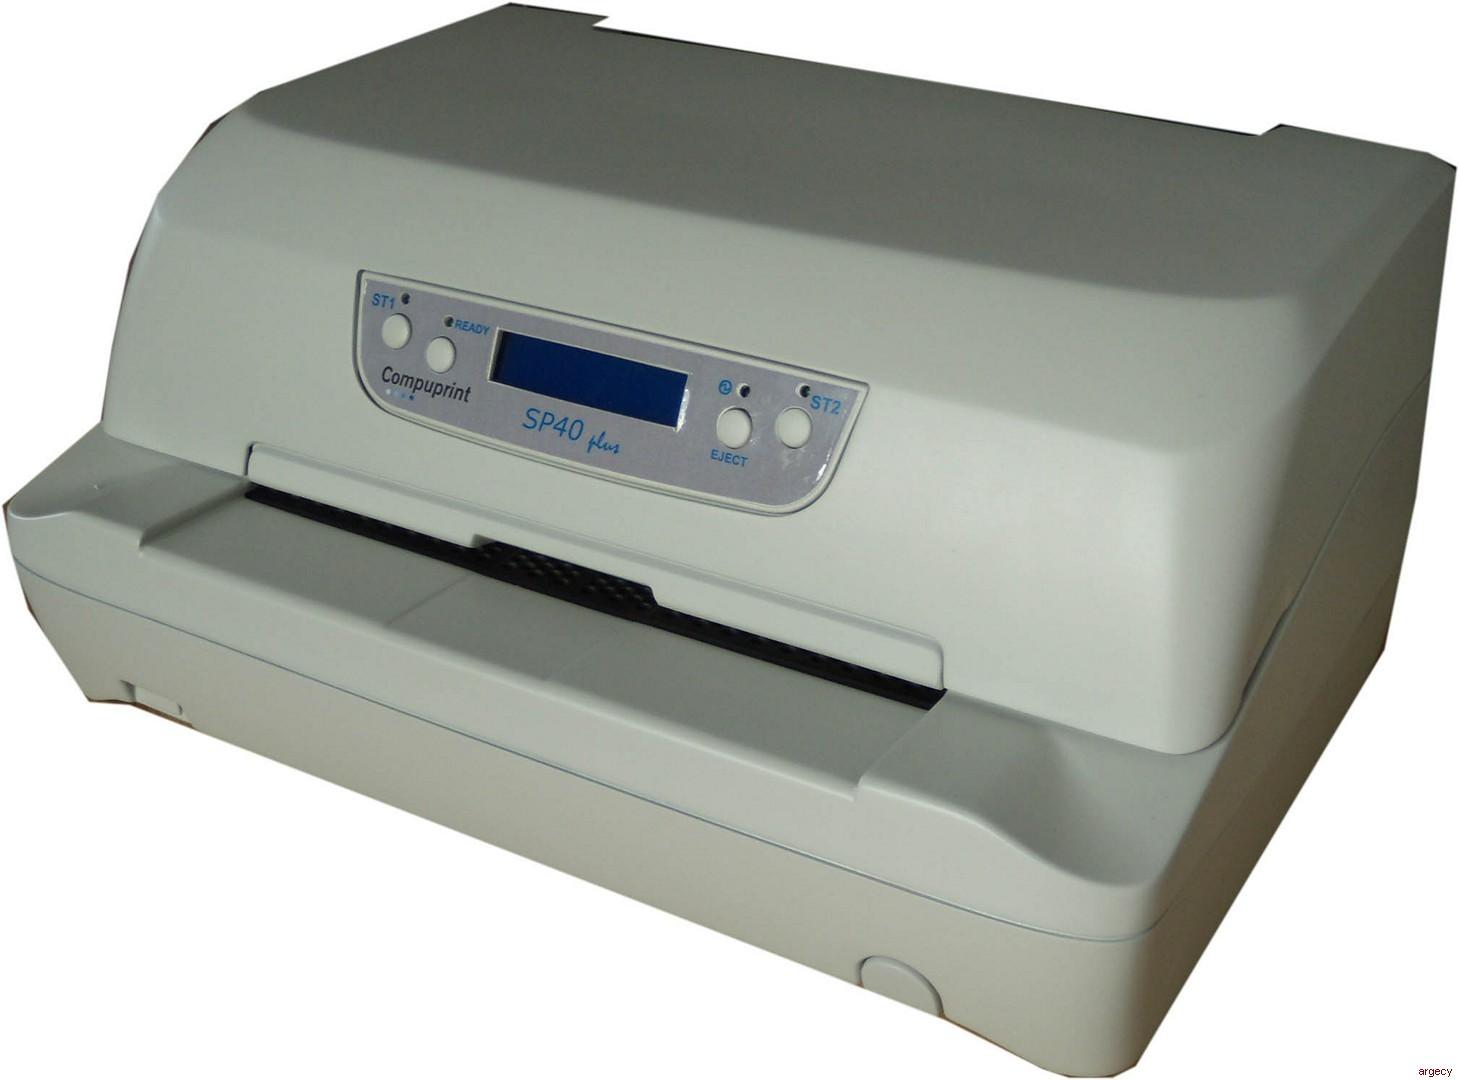 Compuprint SP40plus Series